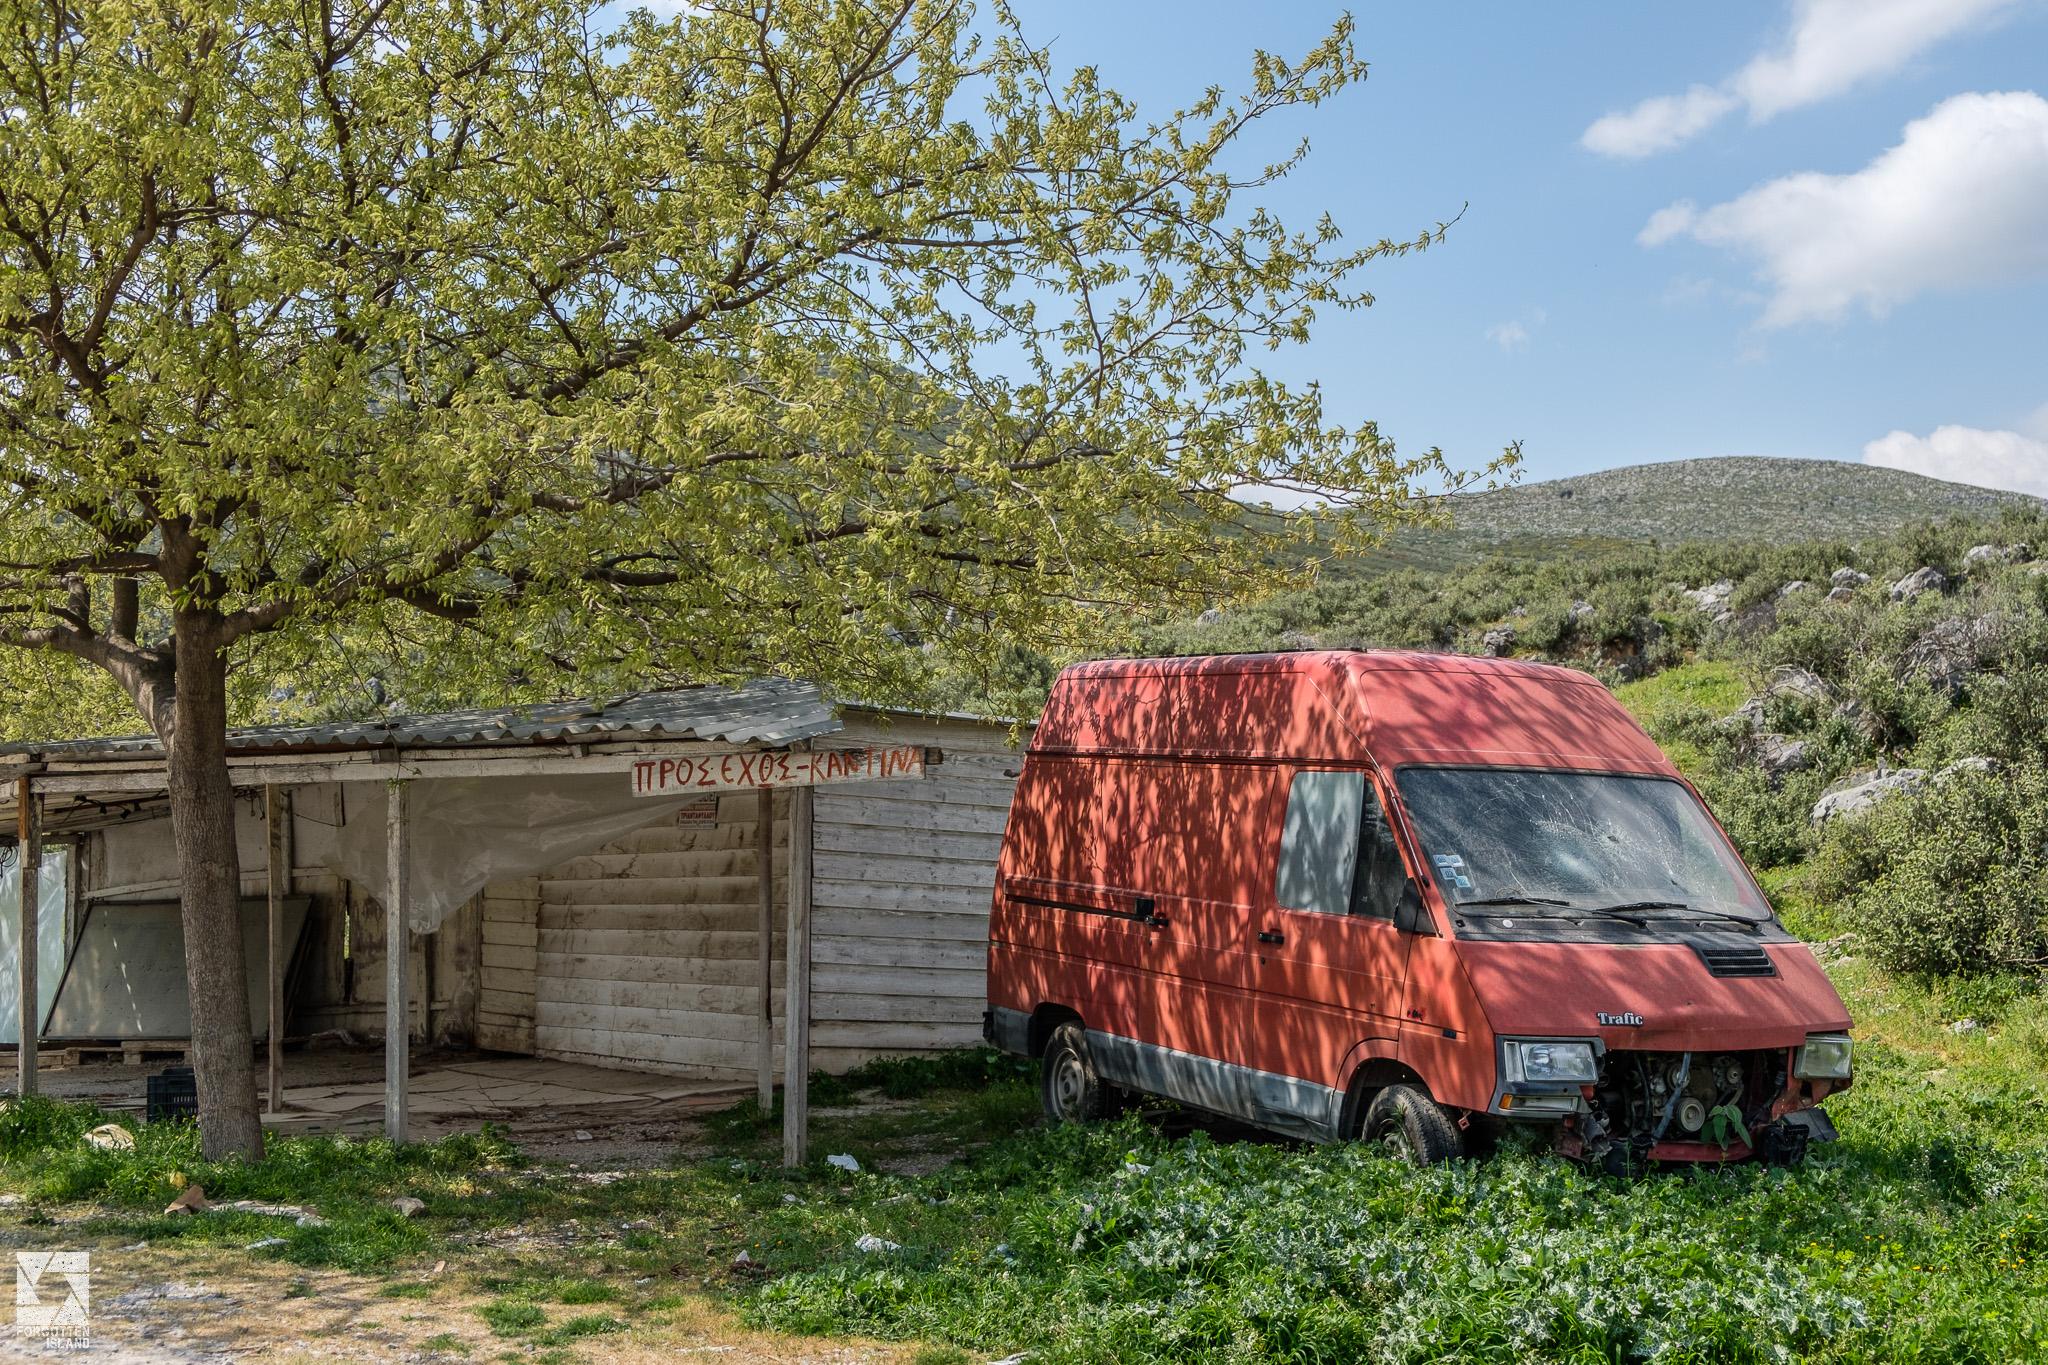 Abandoned Greek Cars